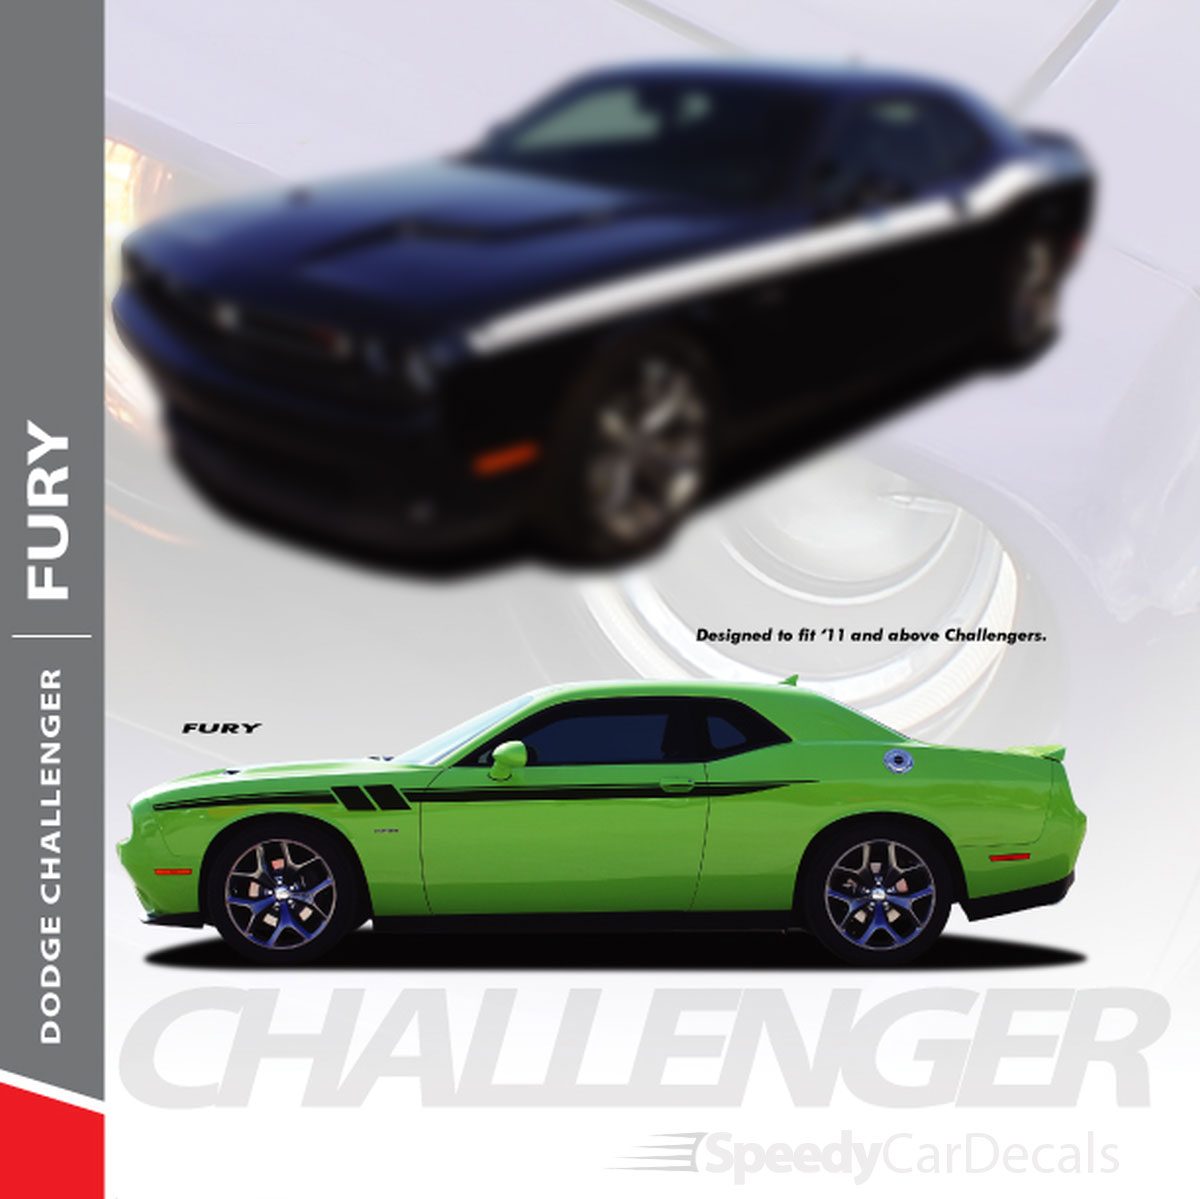 Dodge Challenger Side Body Stripe Kit Fury 3m 2011 2018 2019 2020 2021 Premium And Supreme Install Speedycardecals Fast Car Decals Auto Decals Auto Stripes Vehicle Specific Graphics